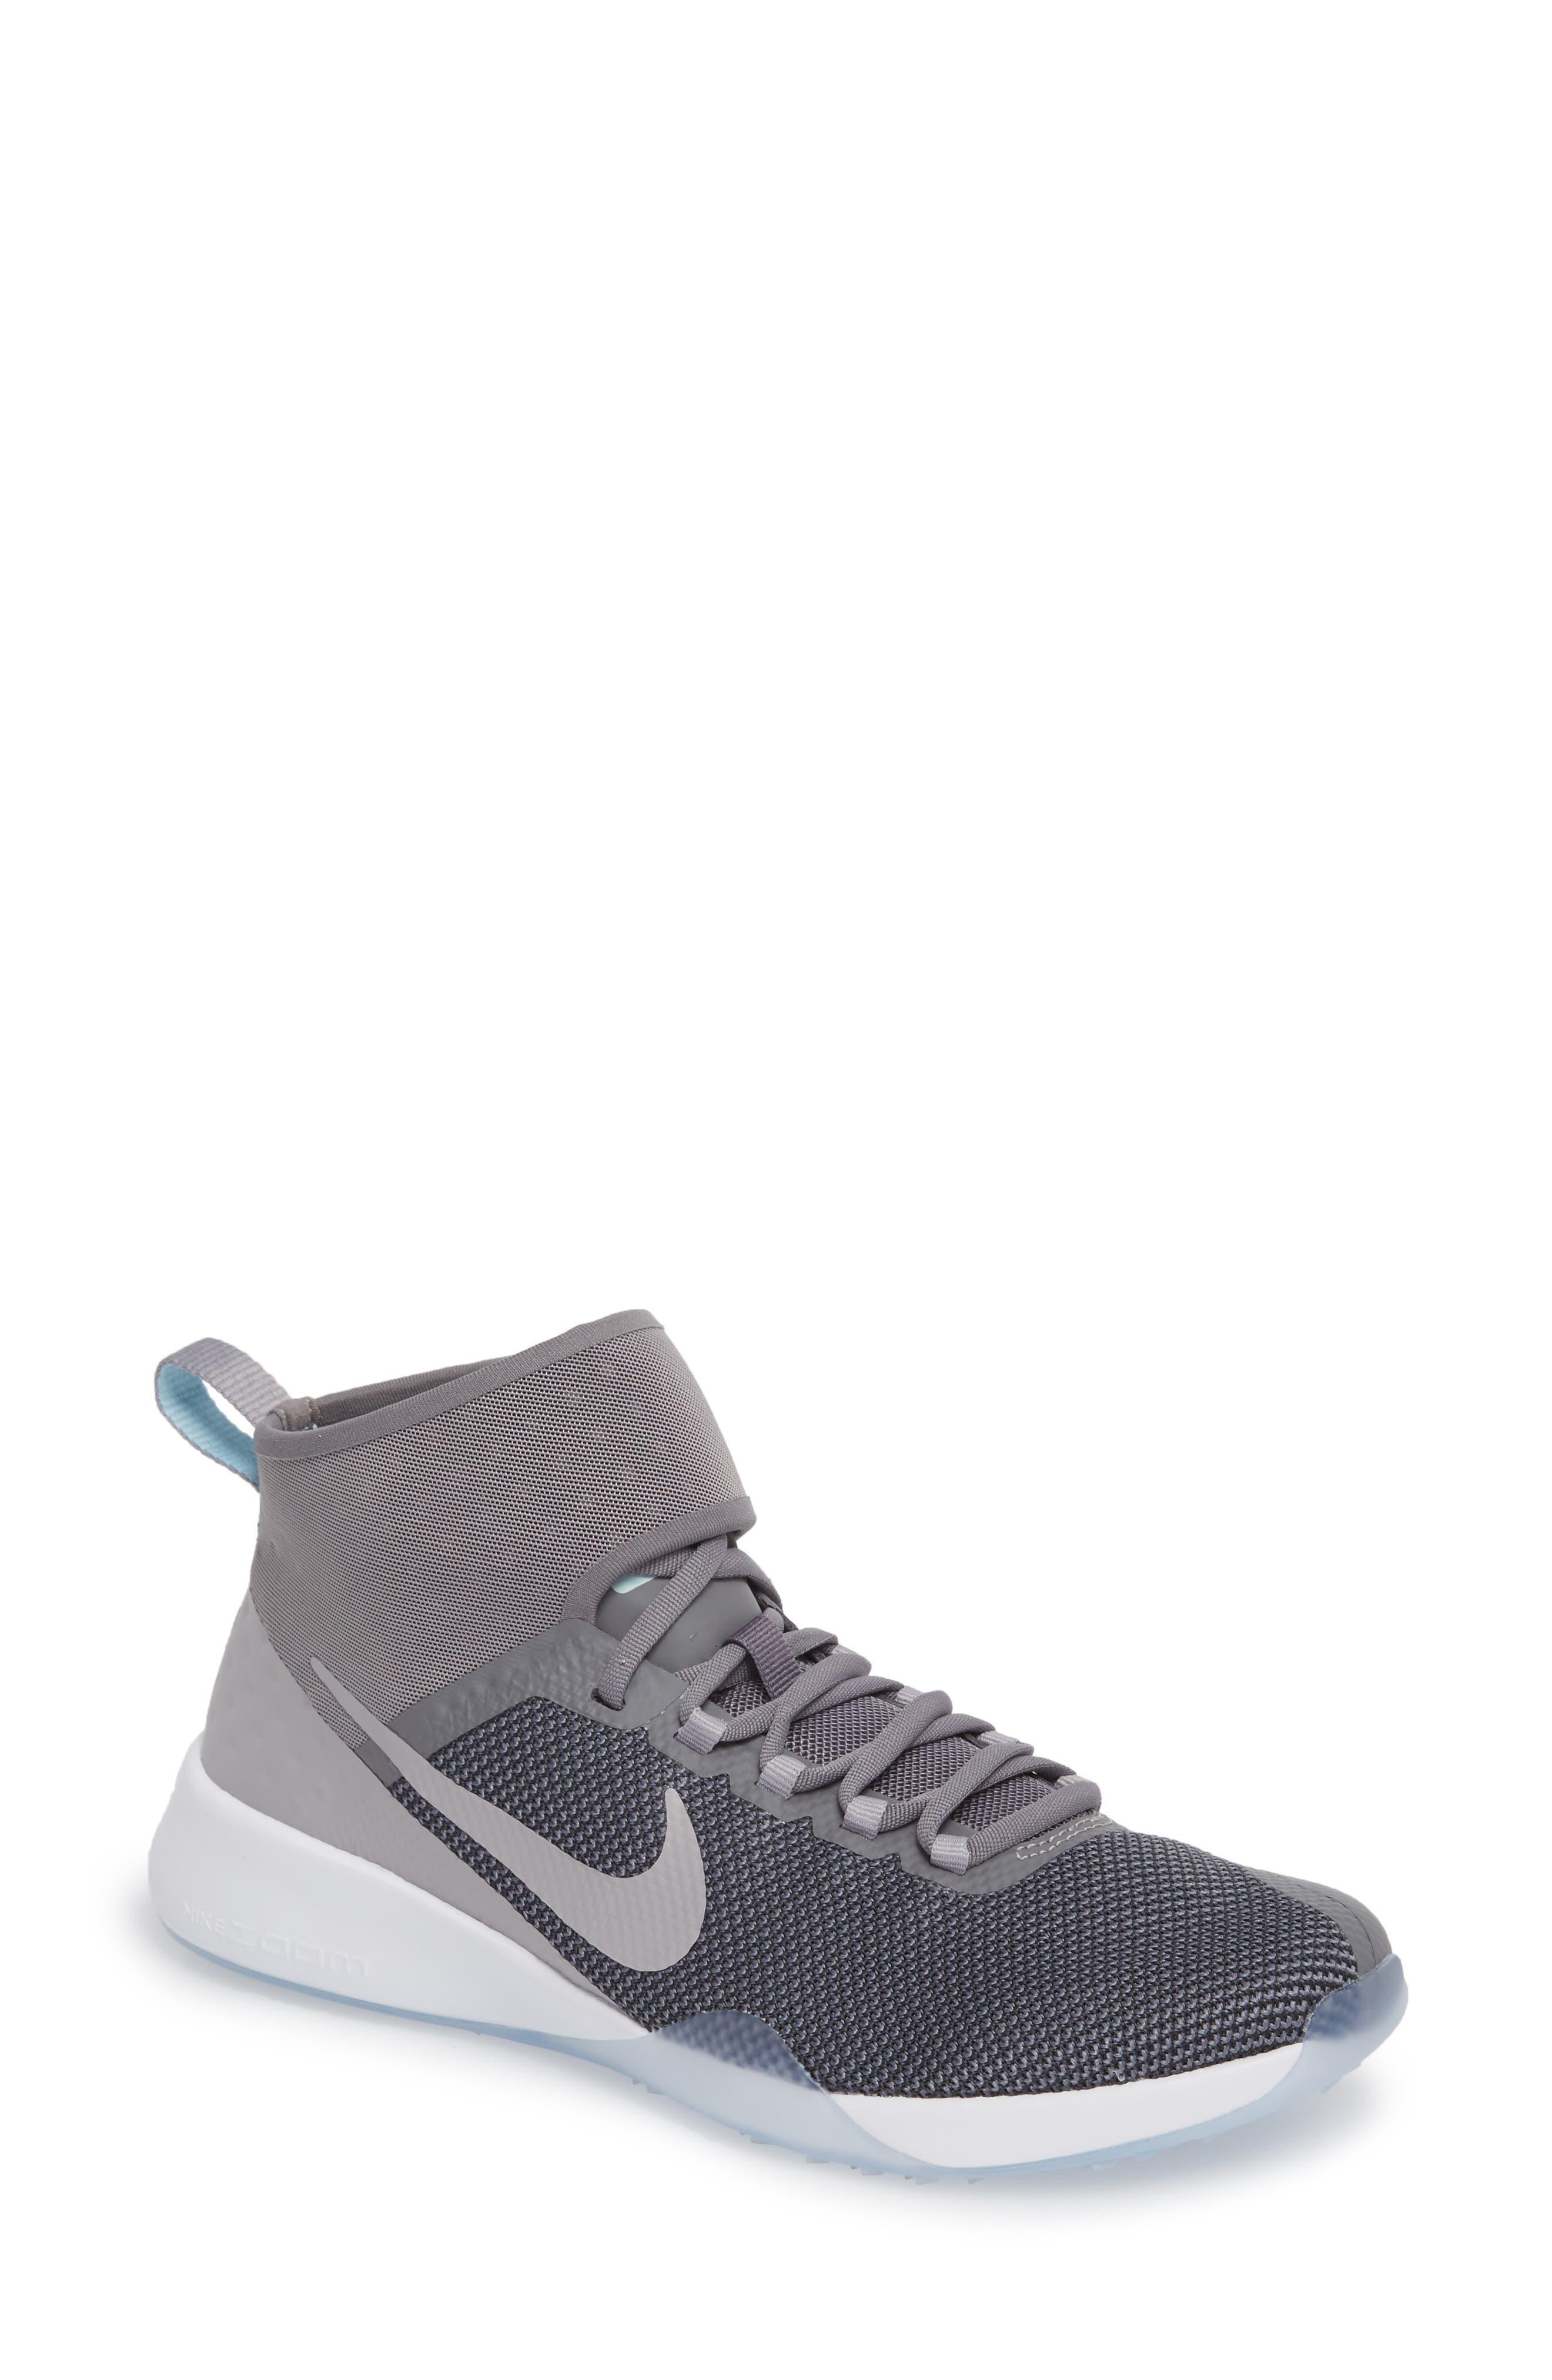 NIKE NikeLab Air Zoom Strong 2 Training Shoe, Main, color, 025